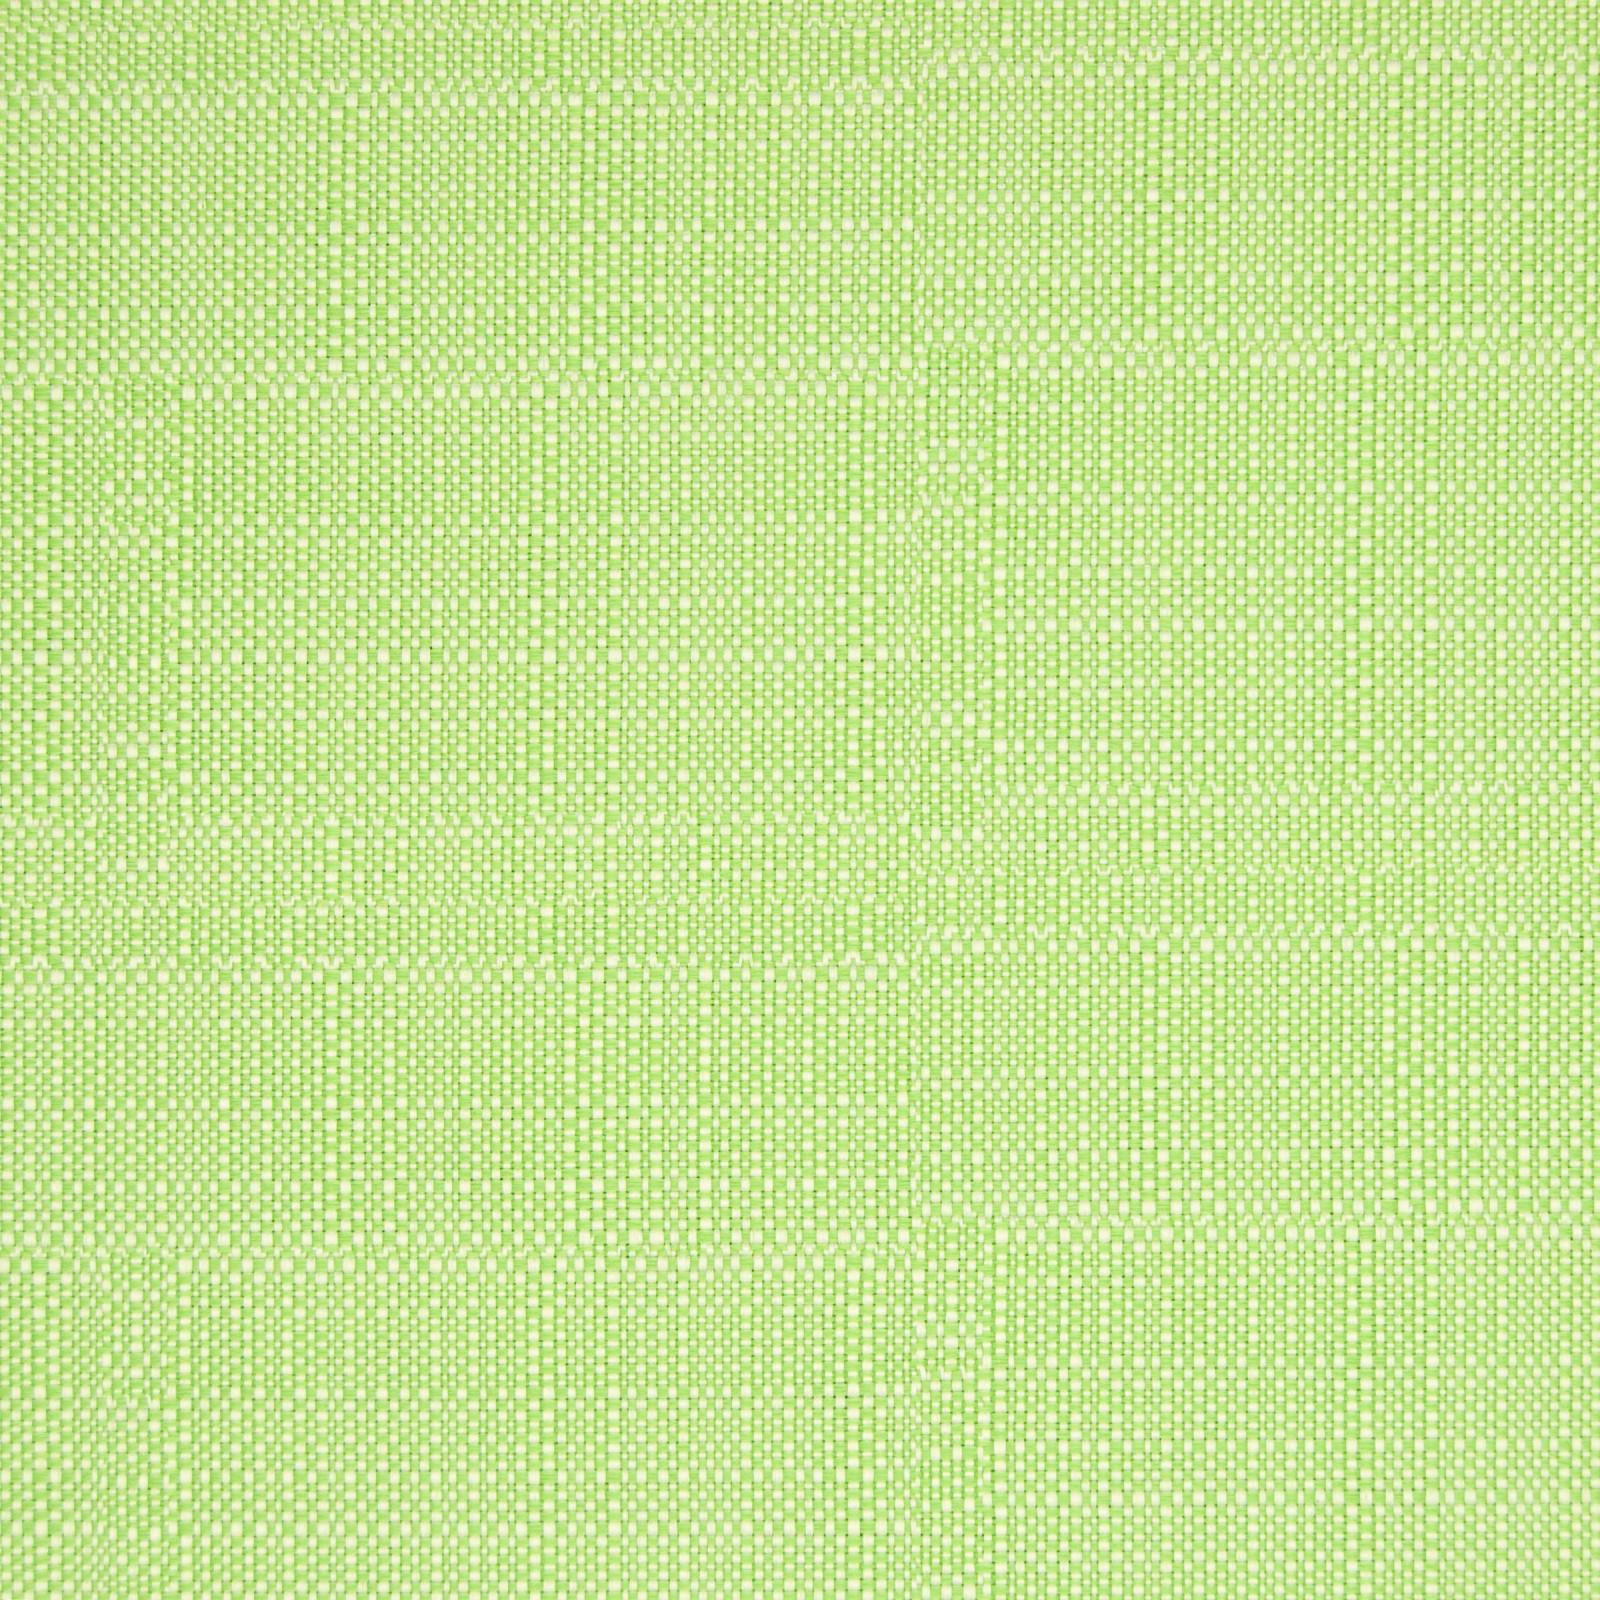 B6880 Island Green | Greenhouse Fabrics